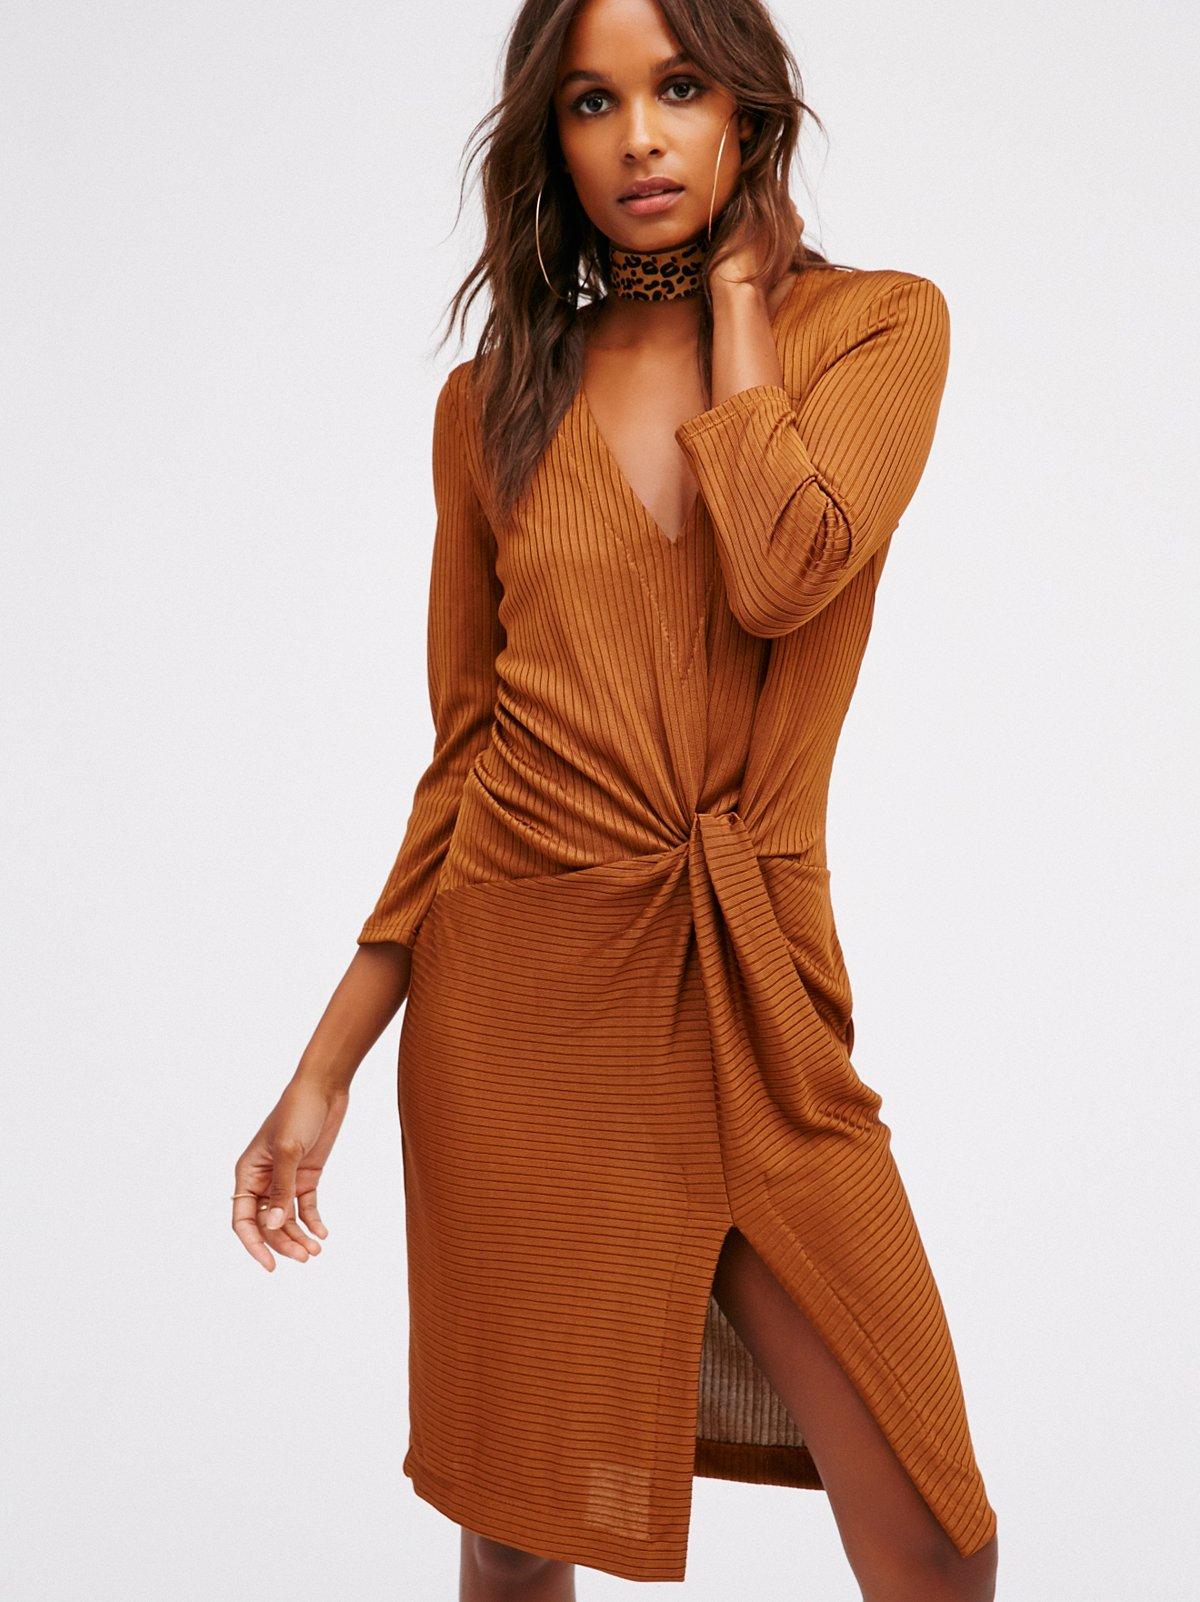 Irene Twist Knit Dress